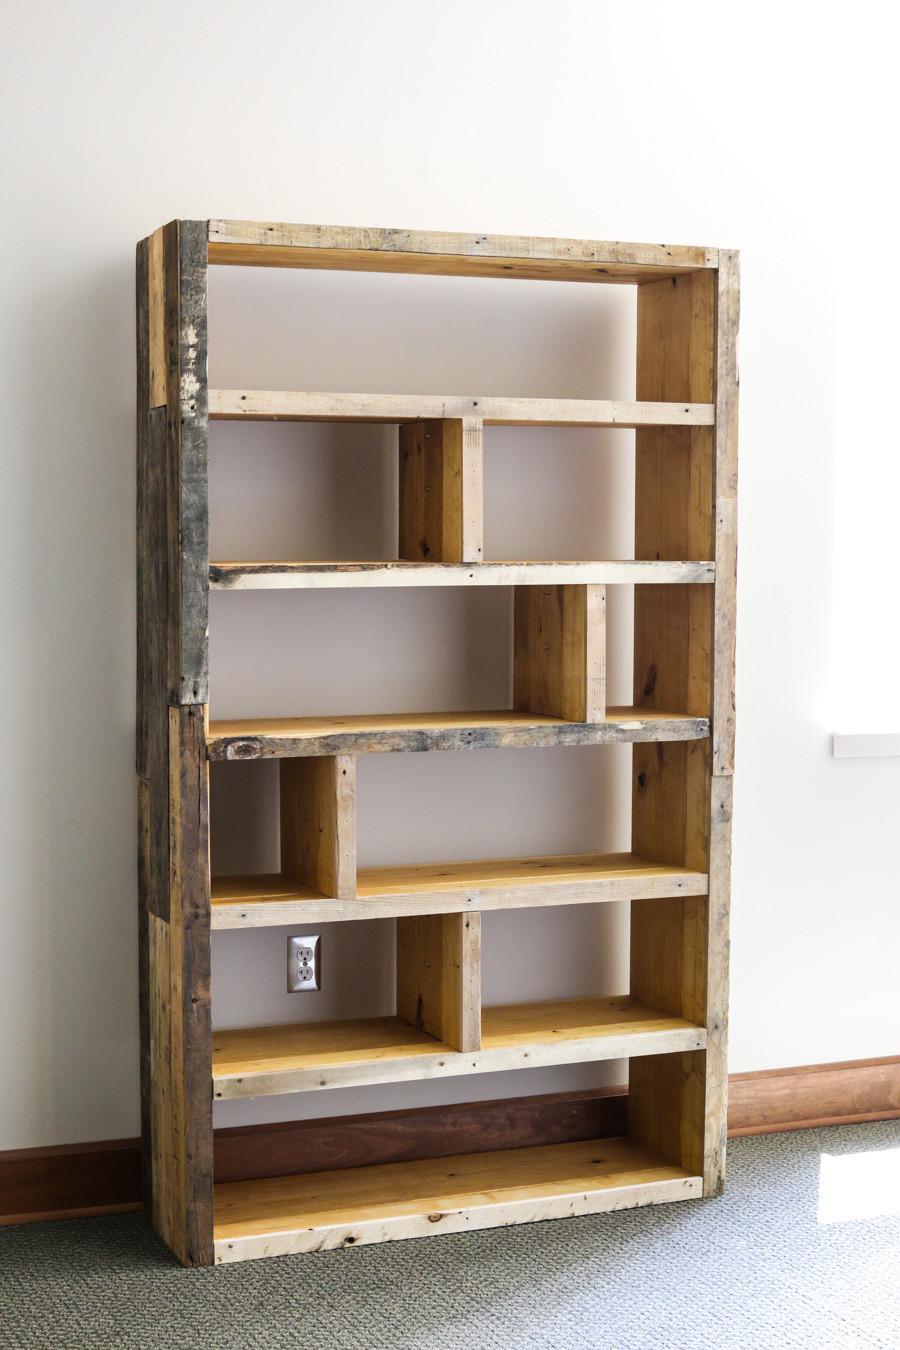 Best ideas about DIY Wood Bookshelves . Save or Pin DIY Rustic Pallet Bookshelf Now.